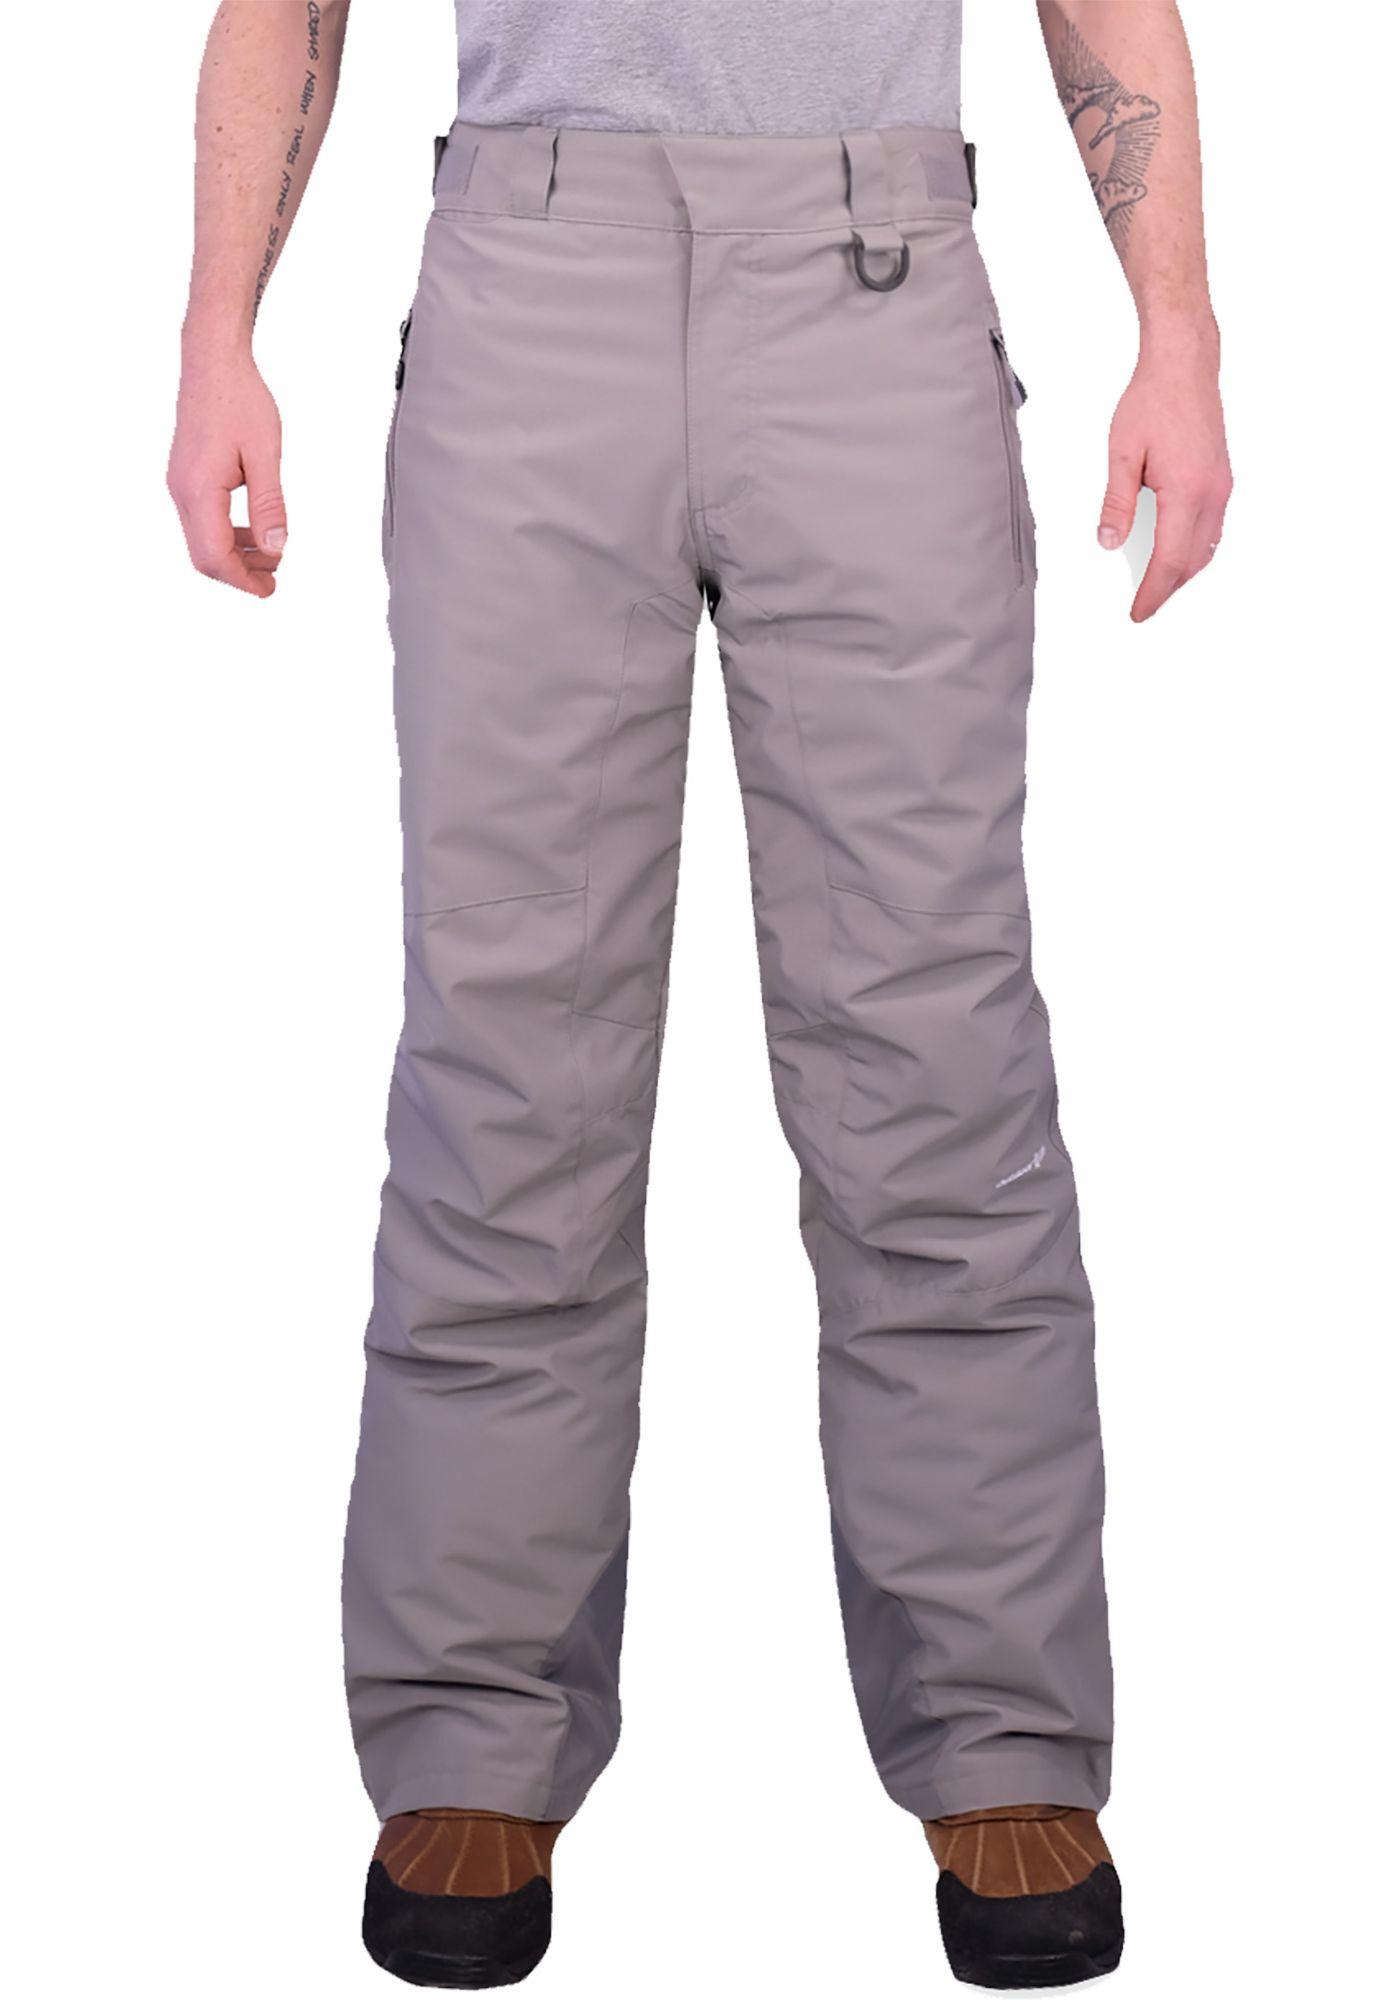 Outdoor Gear Men's Polar Pants